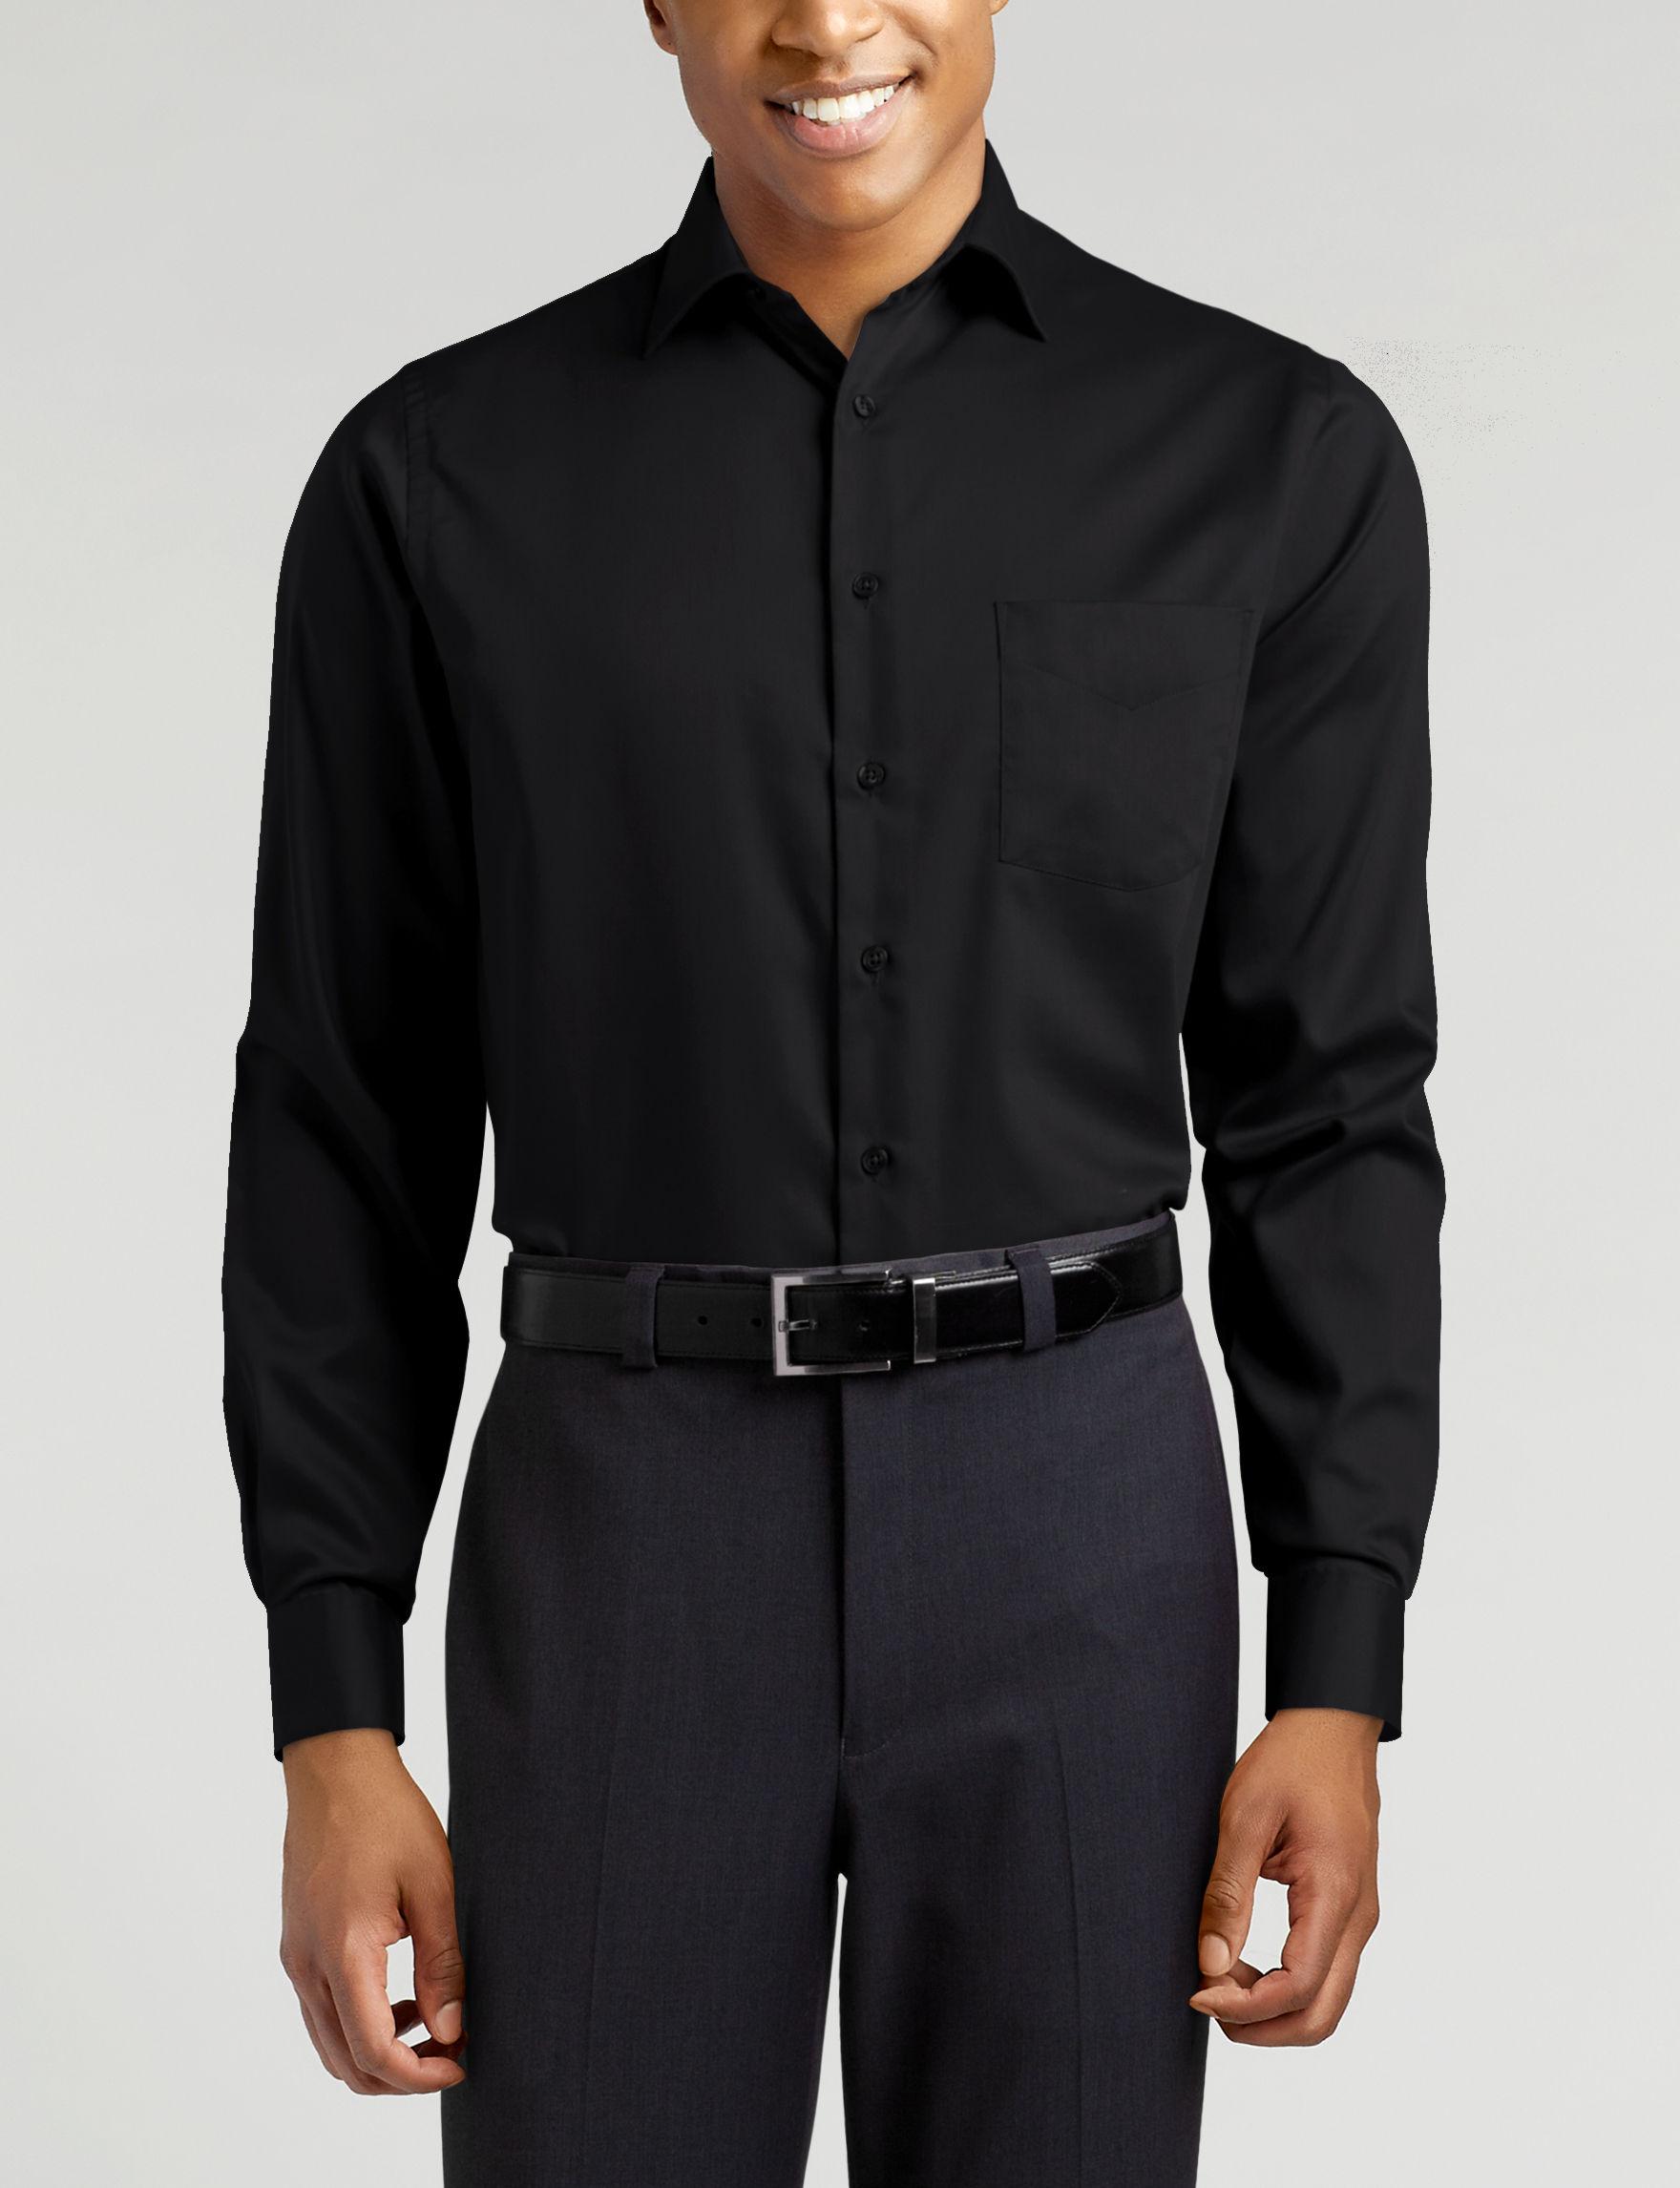 Van Heusen Black Dress Shirts